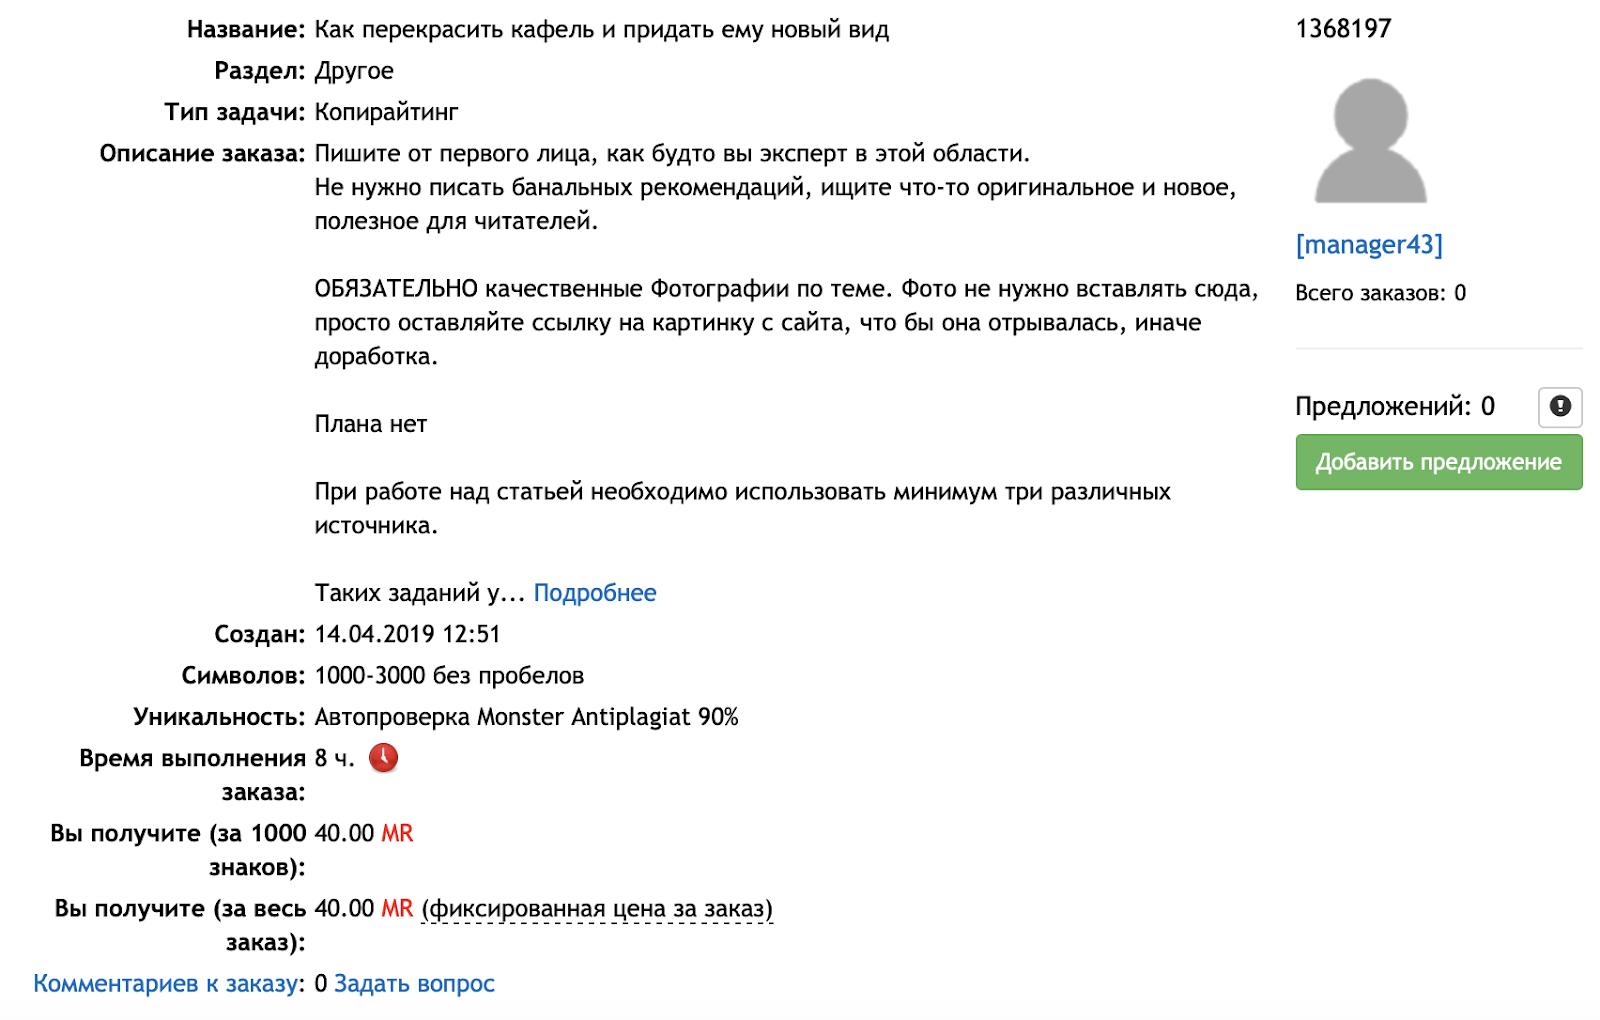 заявка Contentmonster